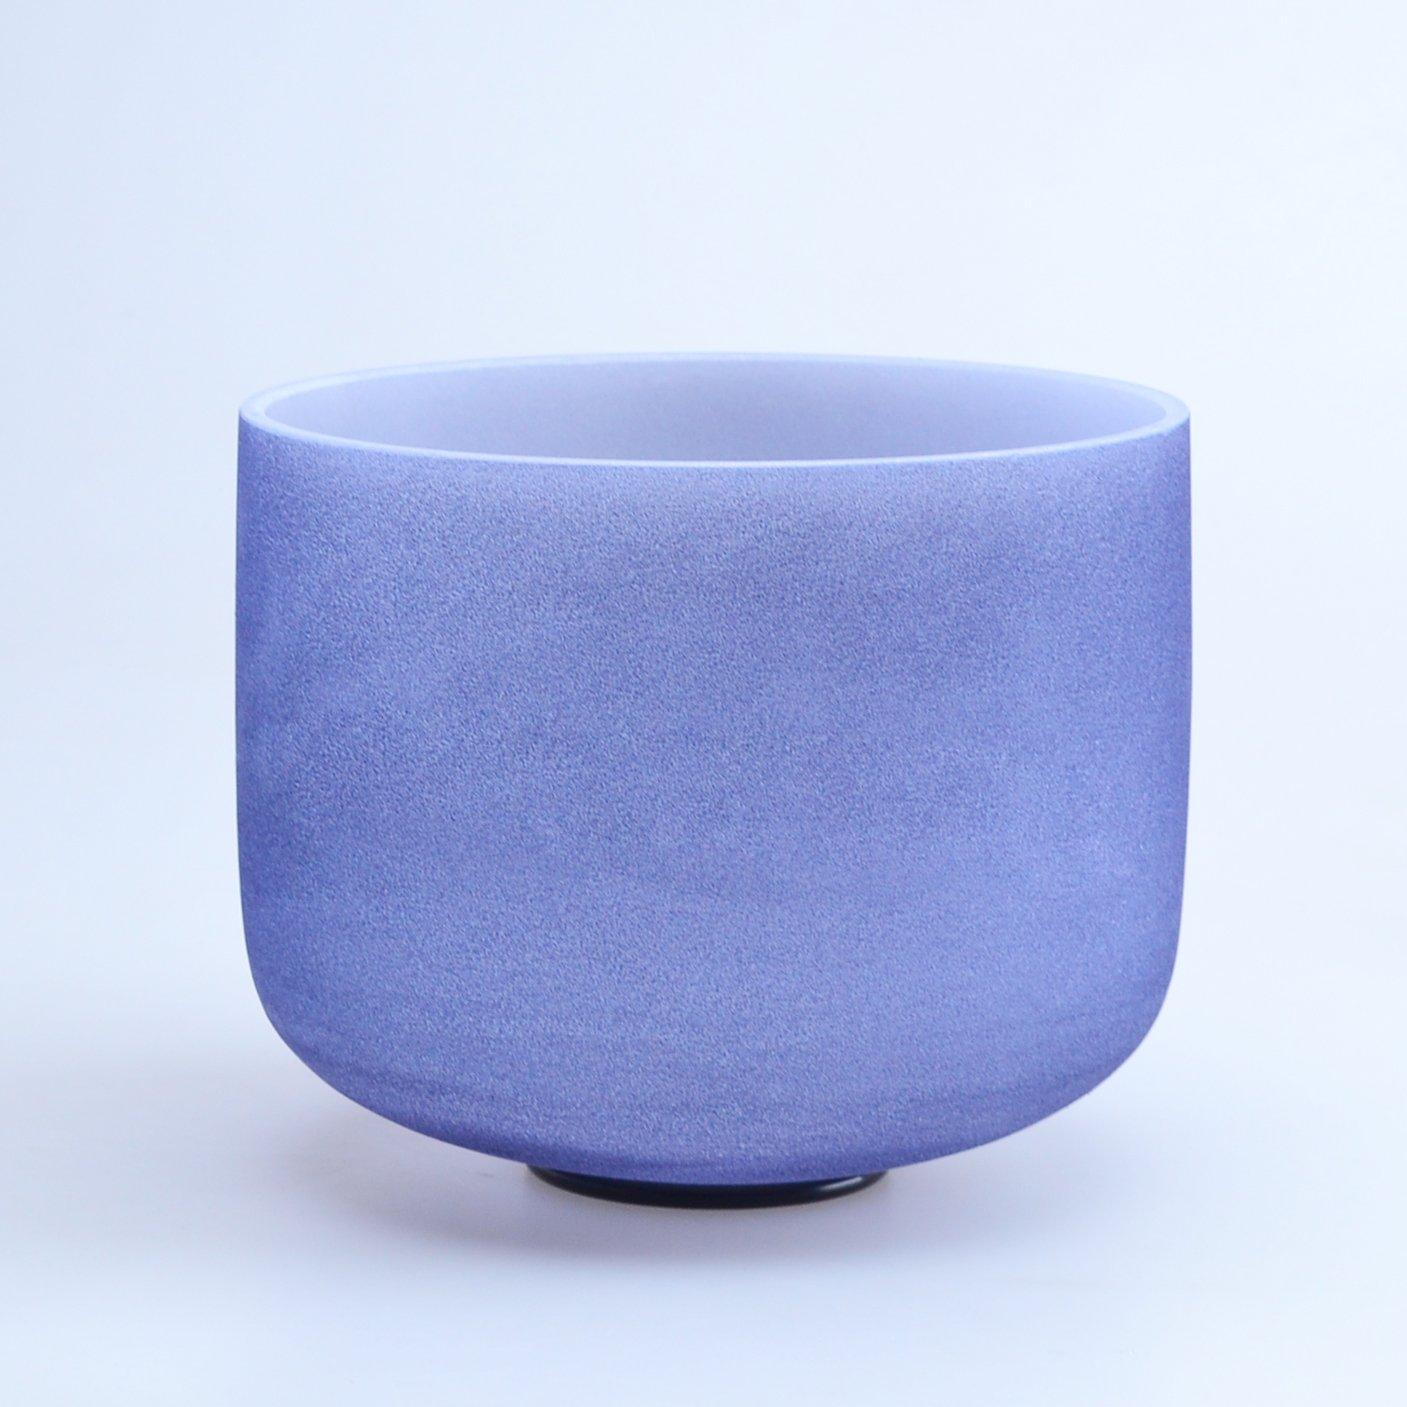 440HZ 8'' A Third Eye Navy Blue Chakra Quartz Crystal Singing Bowl Indigo by Donghai Quartz